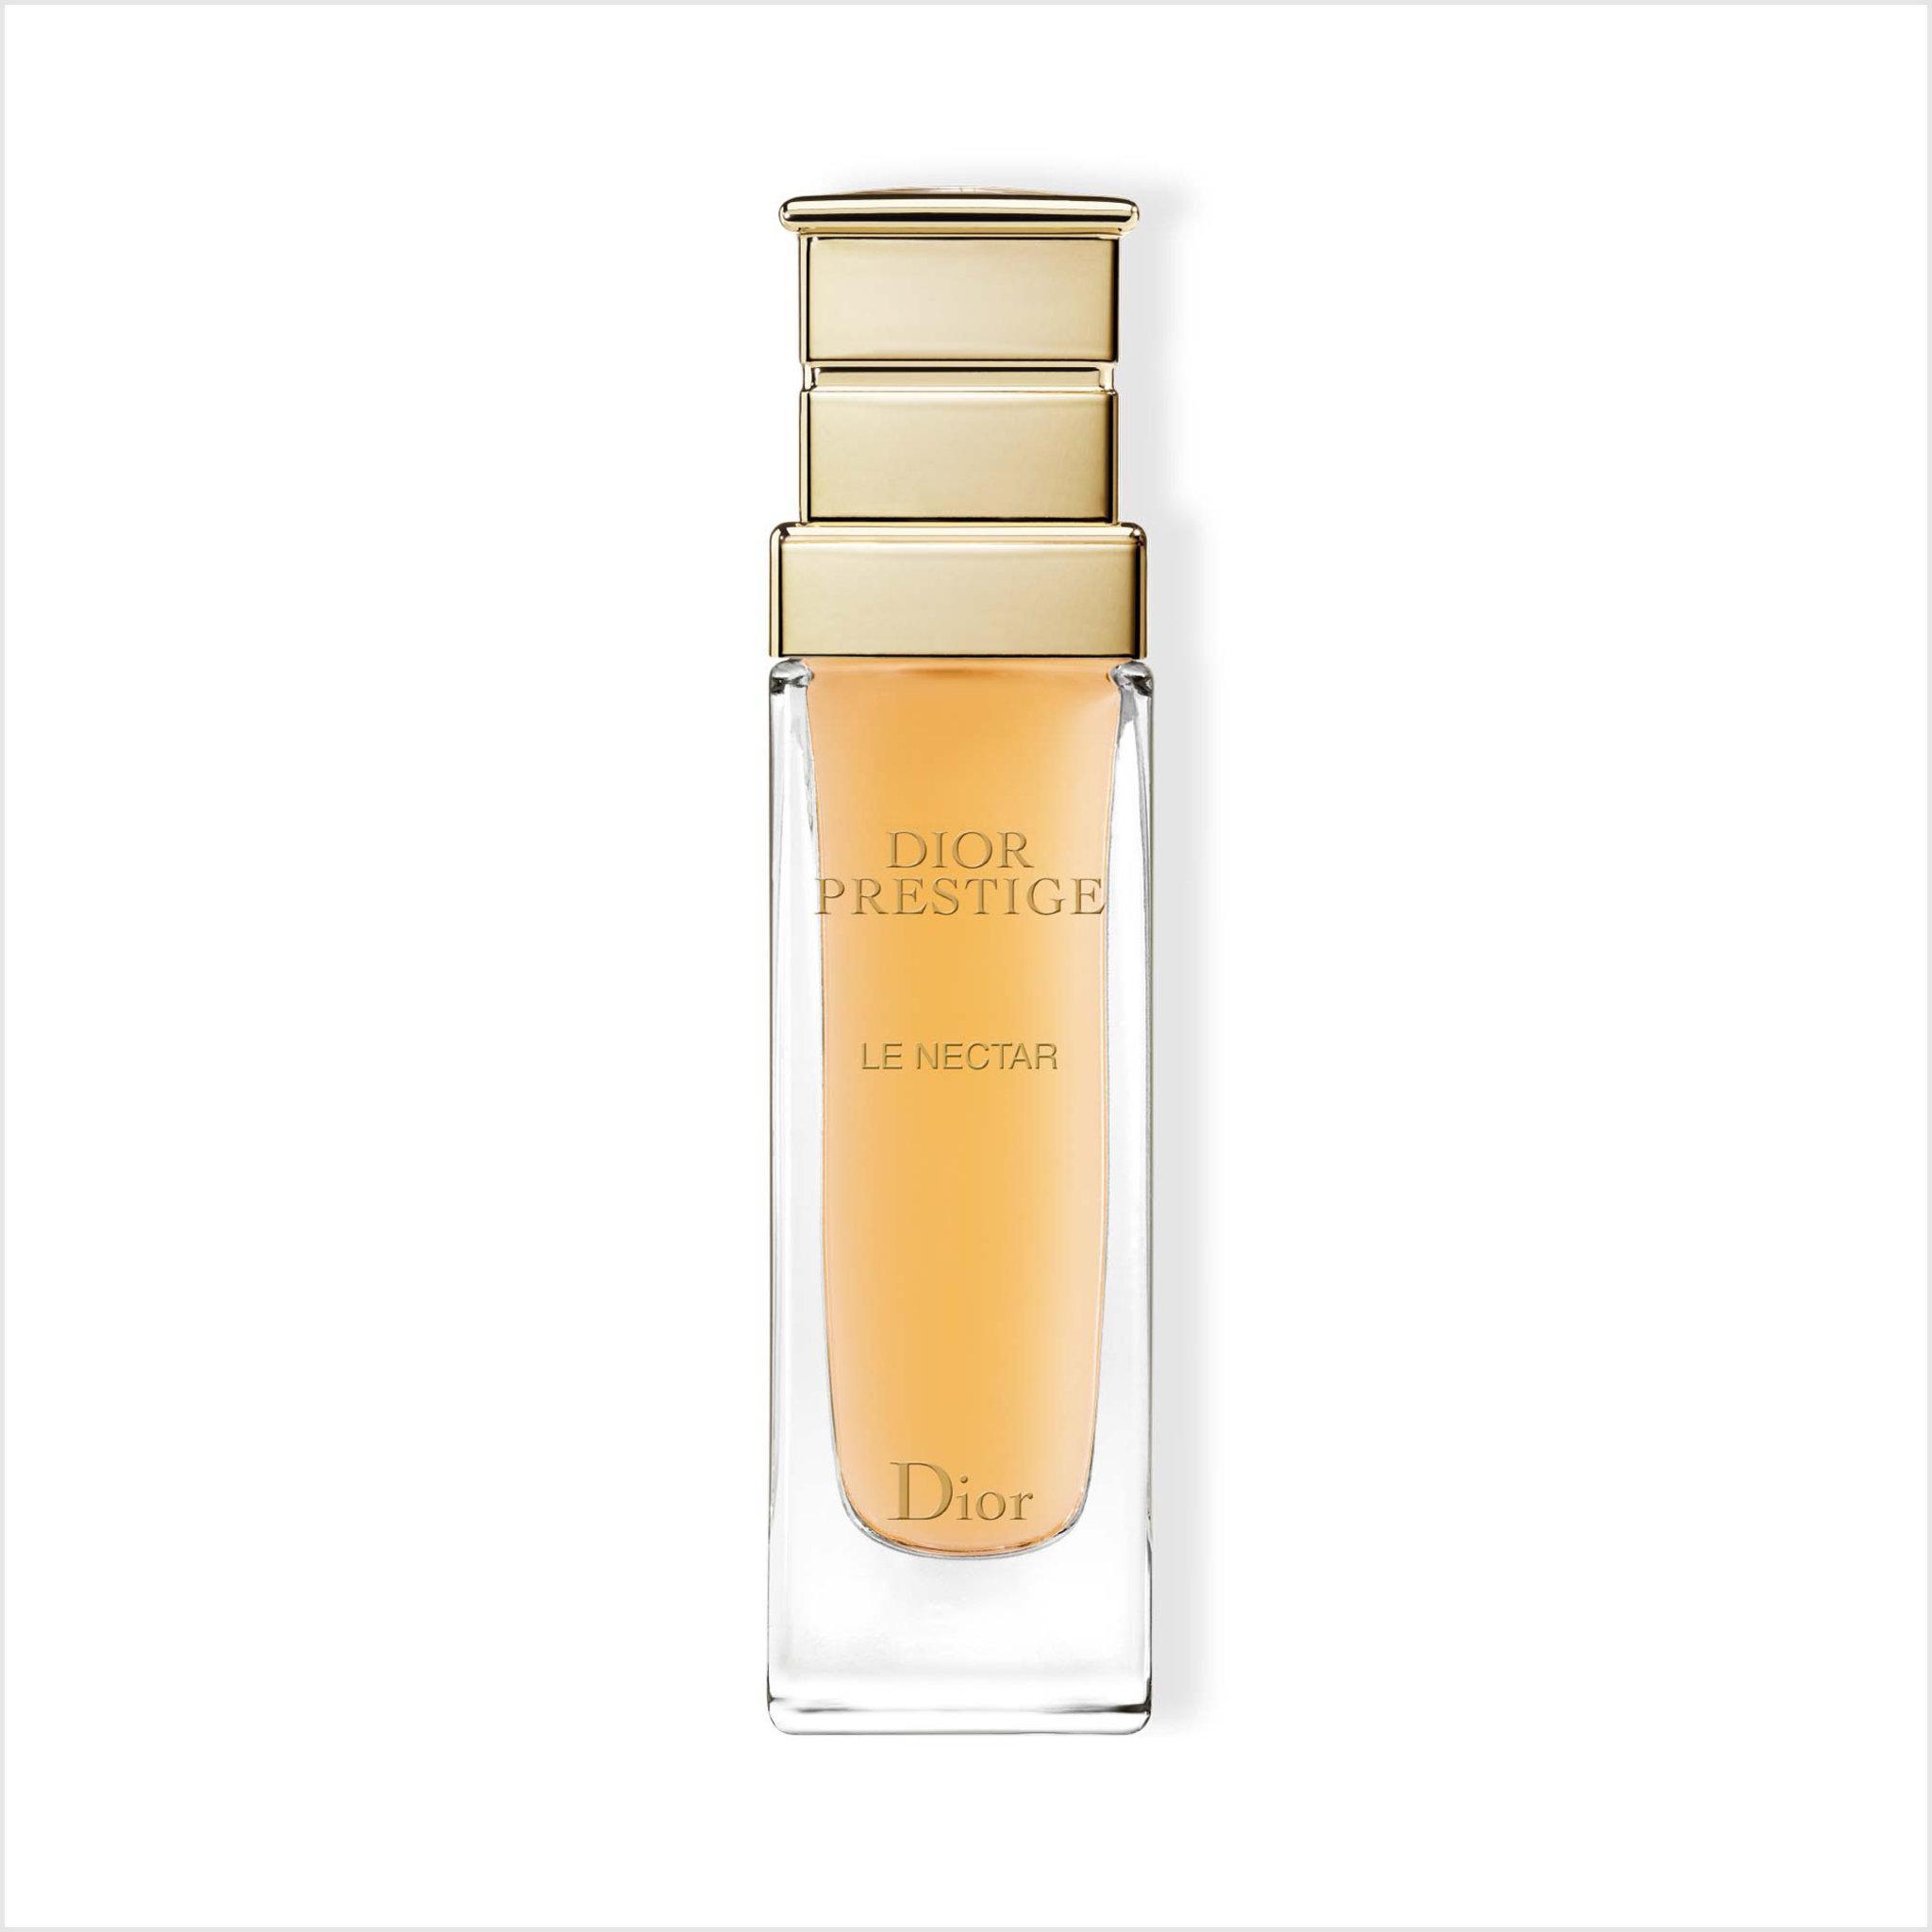 Dior Prestige Nectar, 30 ML